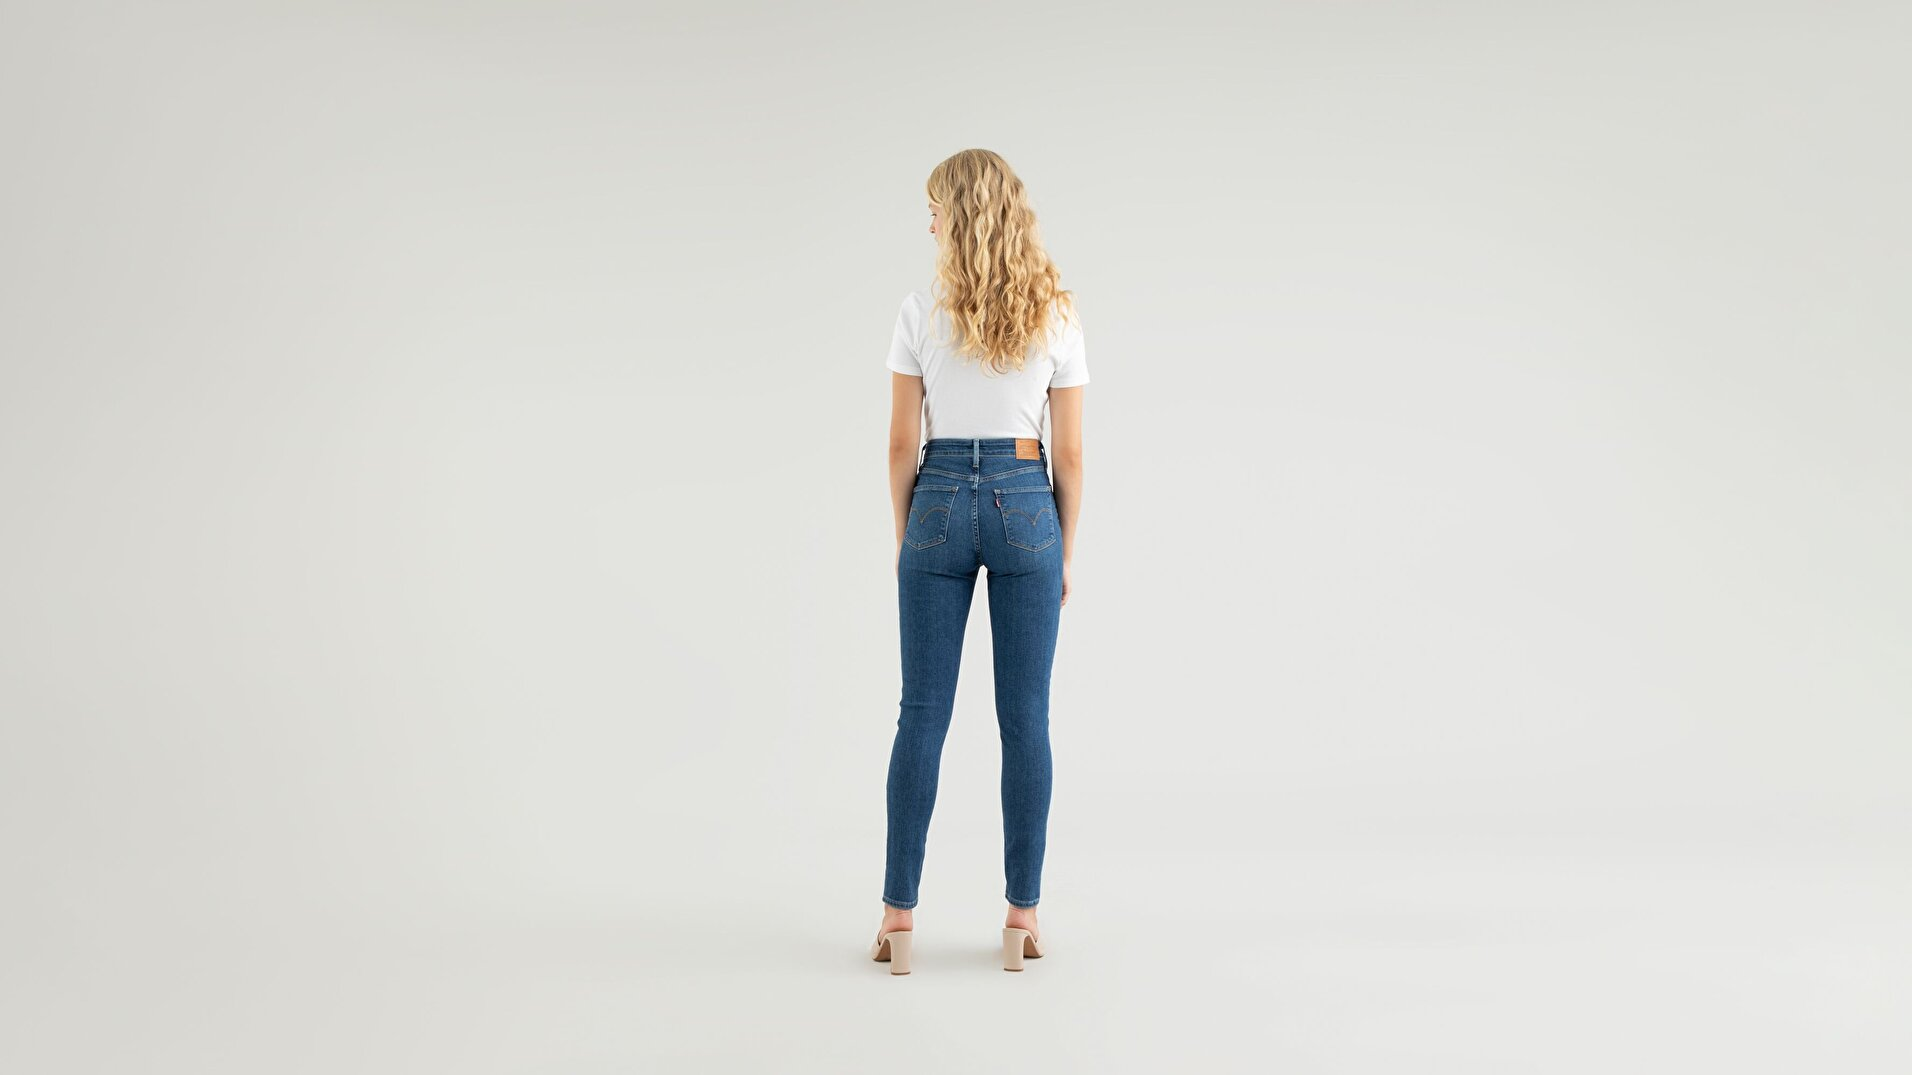 721 Yüksel Bel Skinny Fit Kadın Jean Pantolon-Good Afternoon